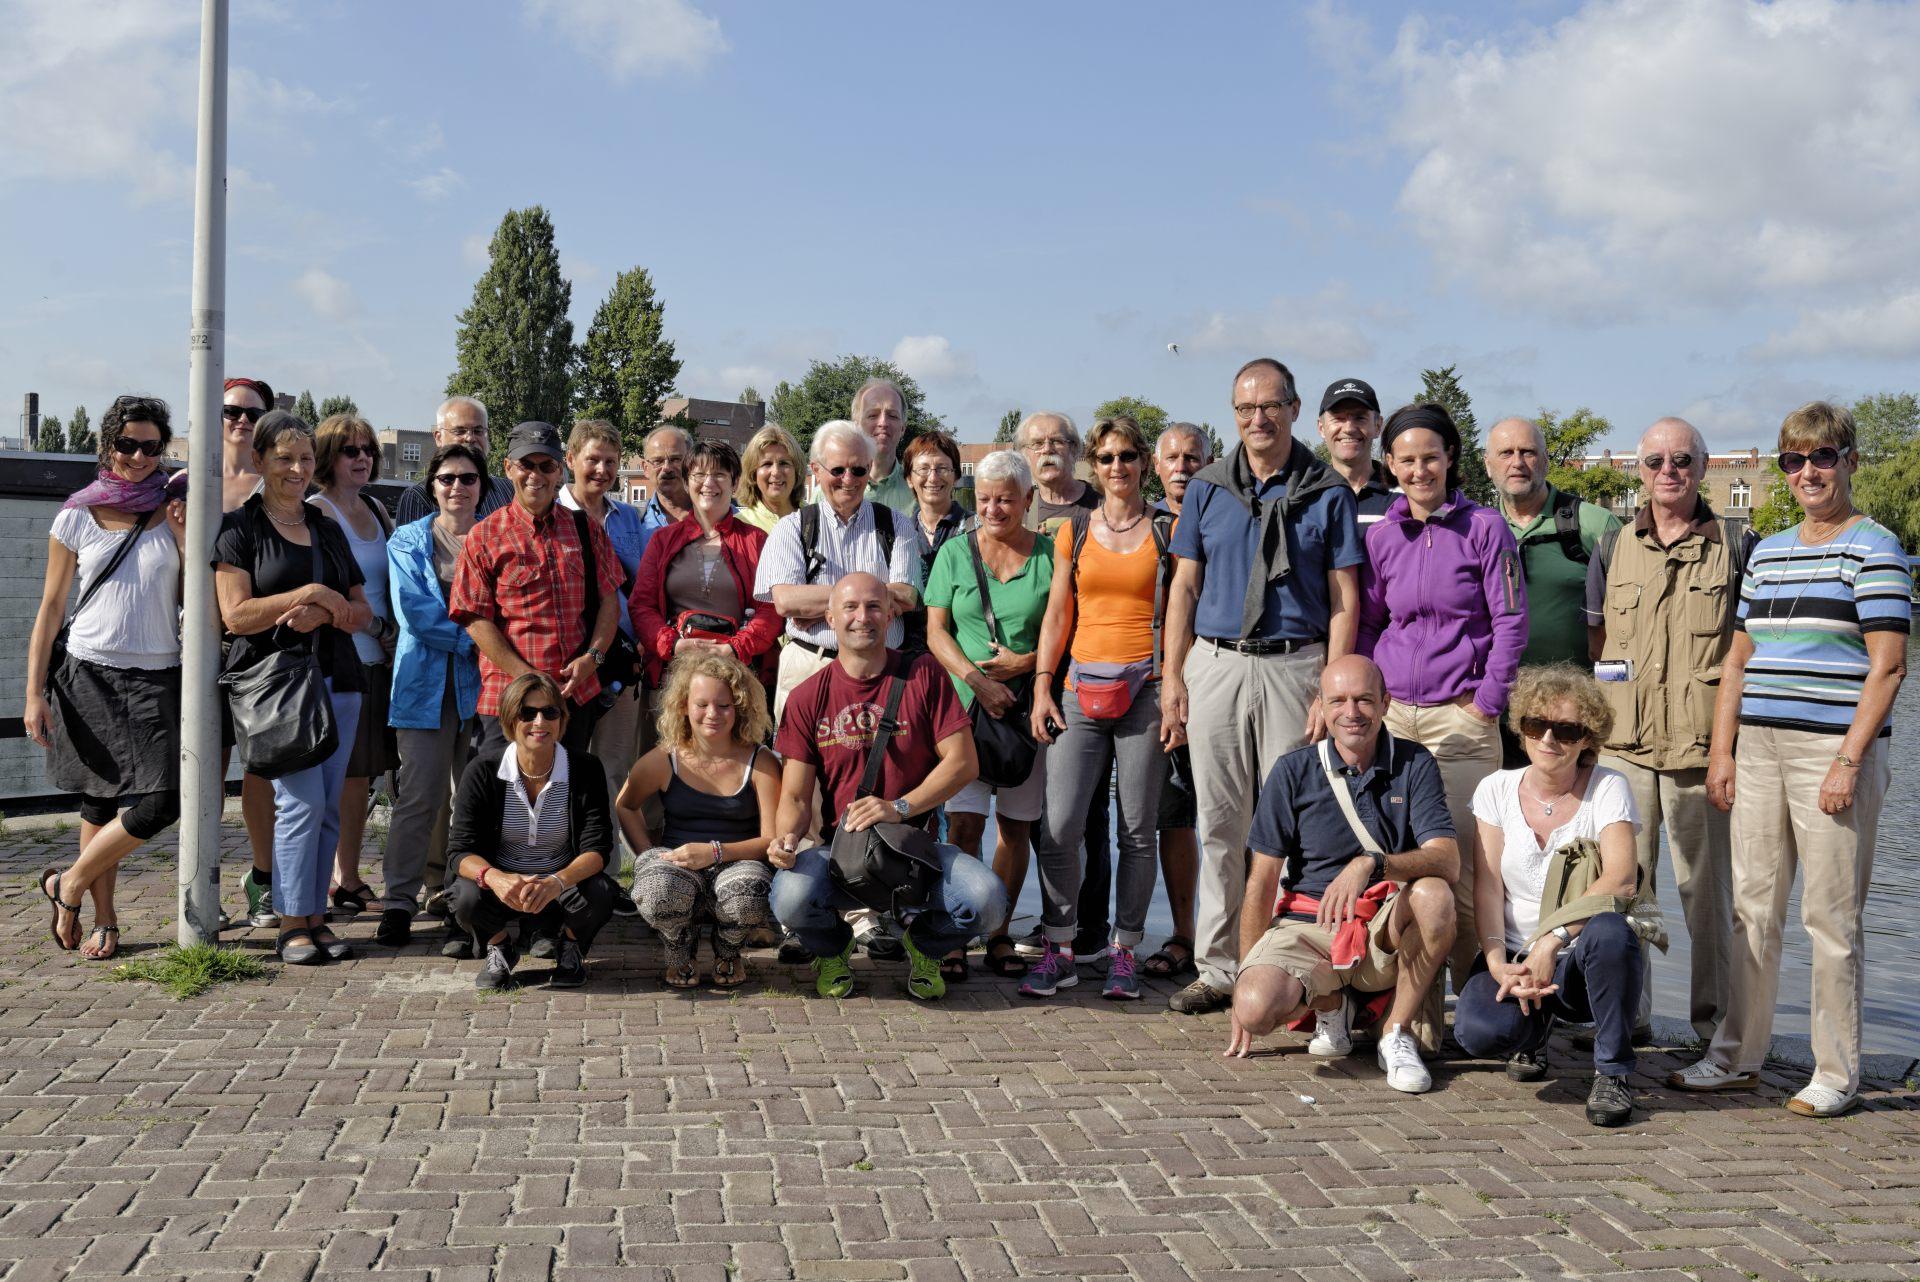 2014-10-13-amsterdam-4